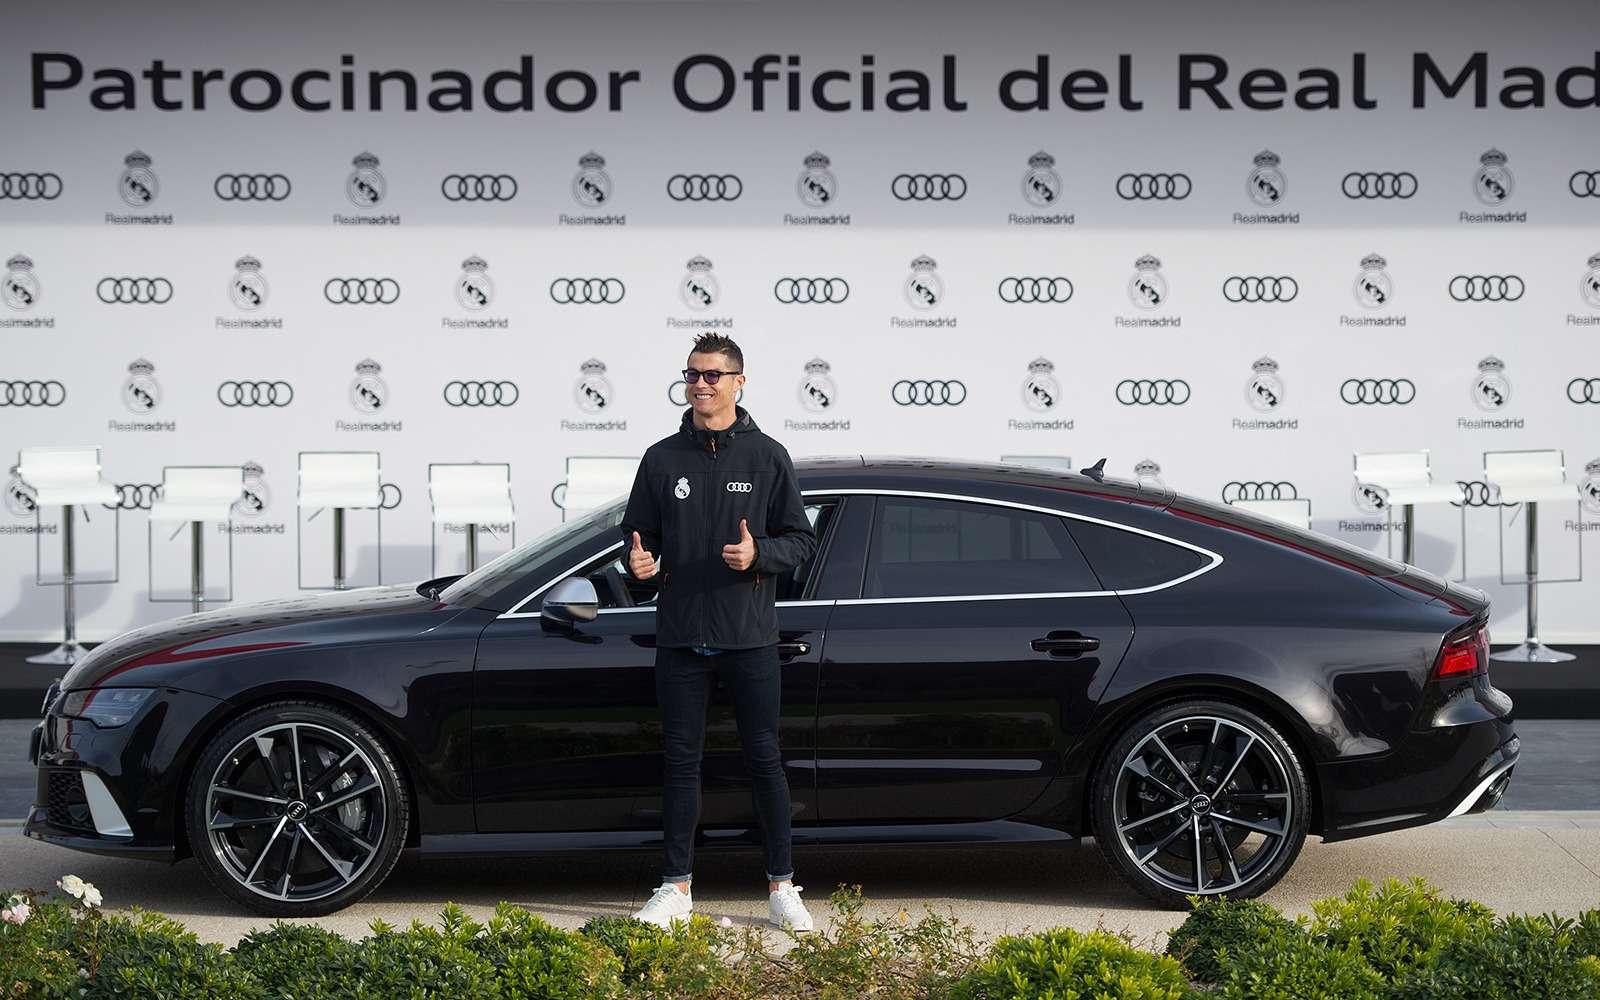 Вотэто спонсор! Audi раздала футболистам «Реала» машины— фото 819845